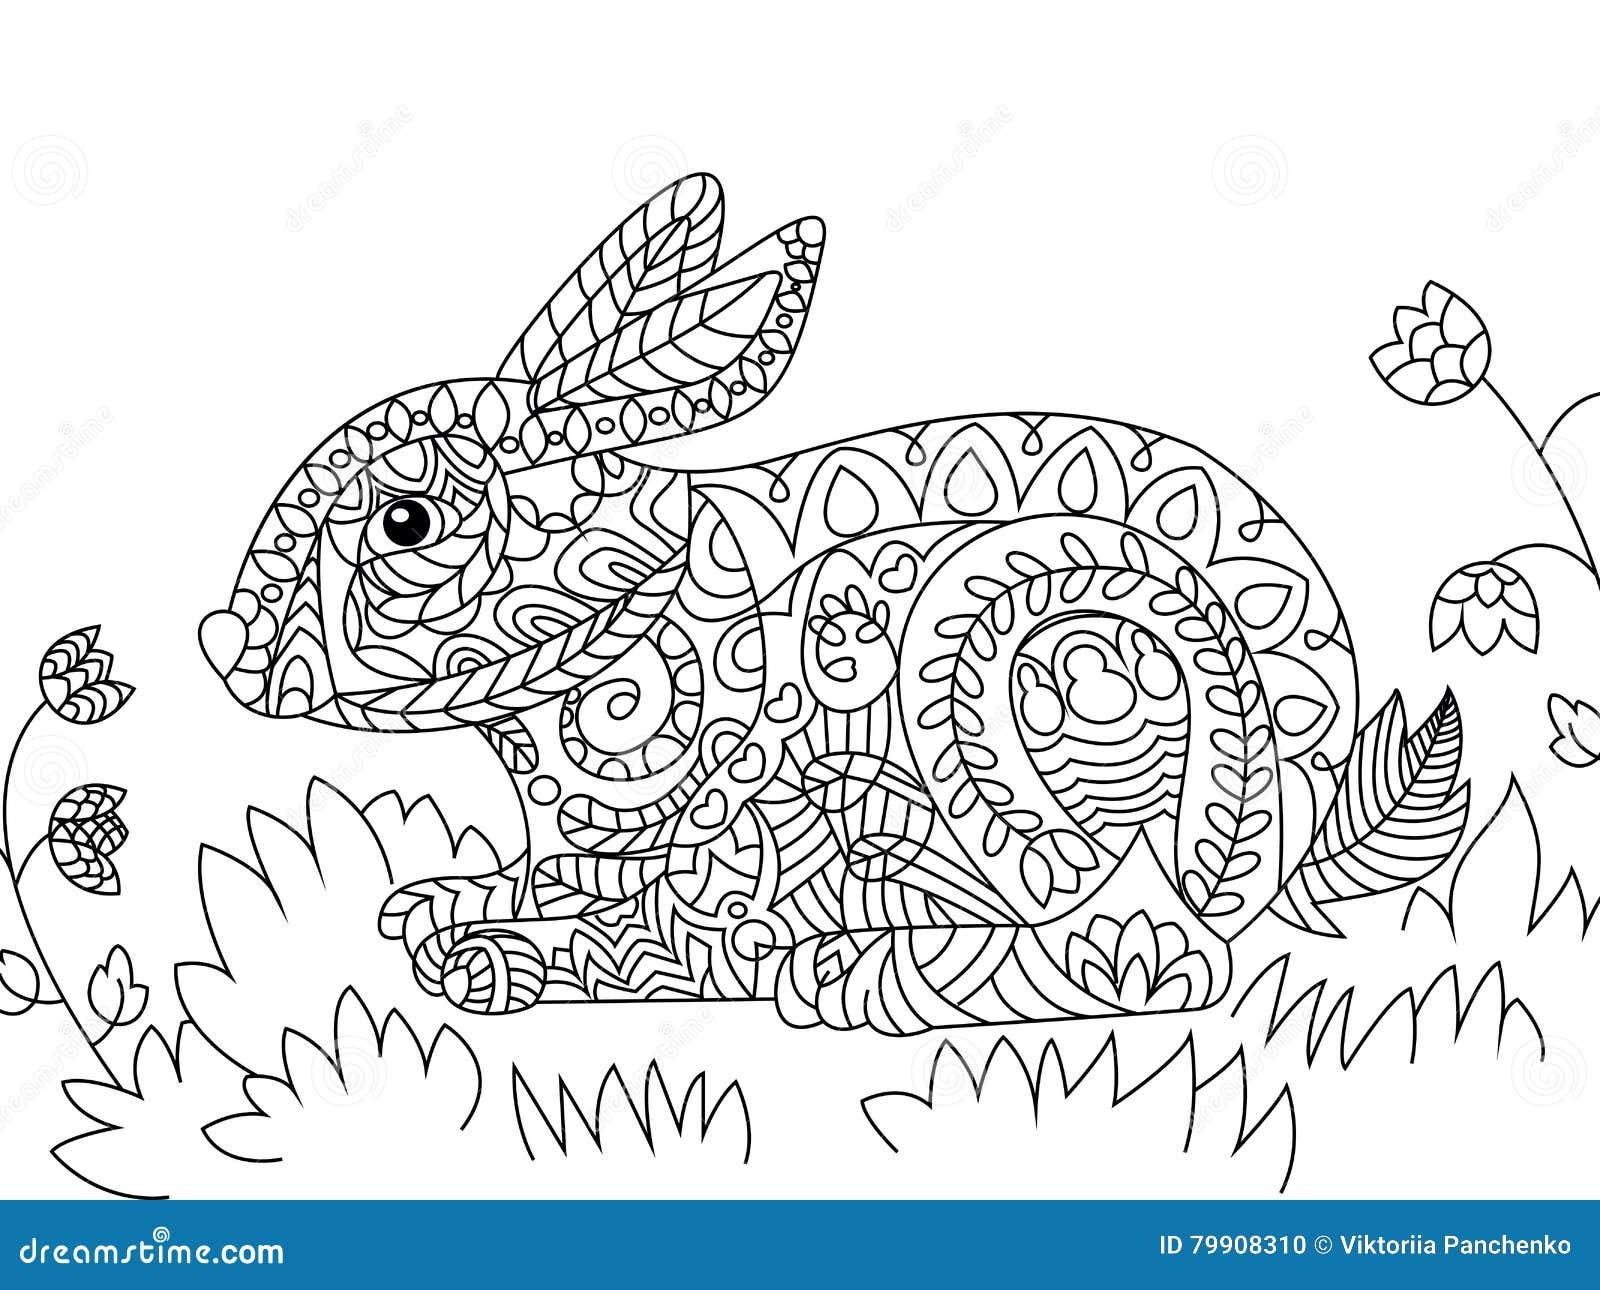 Mandalas De Animales Para Pintar Abstracto Pintar Tattoo: Rabbit Coloring Vector For Adults Stock Vector